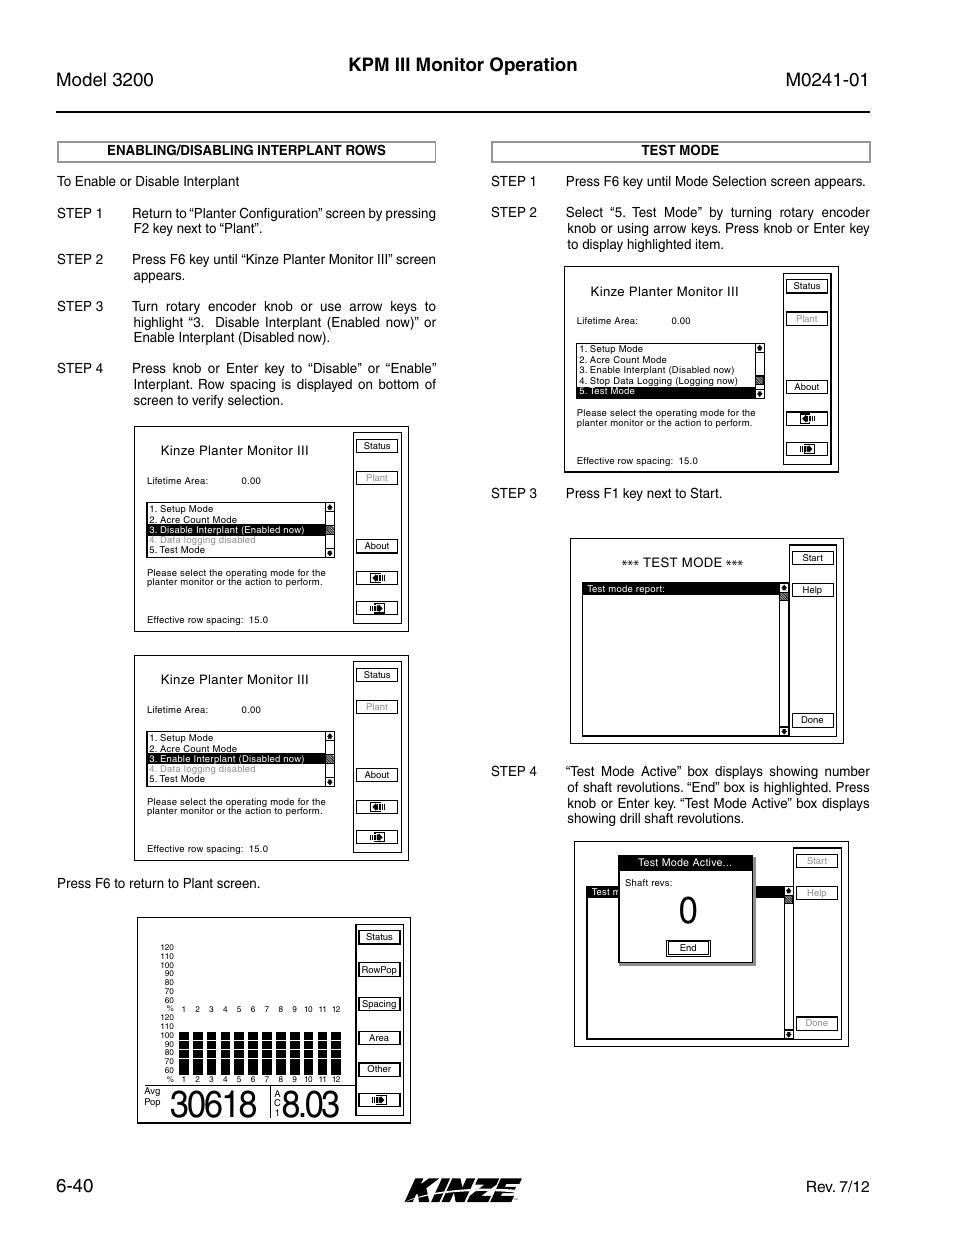 Enabling/disabling interplant rows -40, Test mode -40, Kpm iii monitor